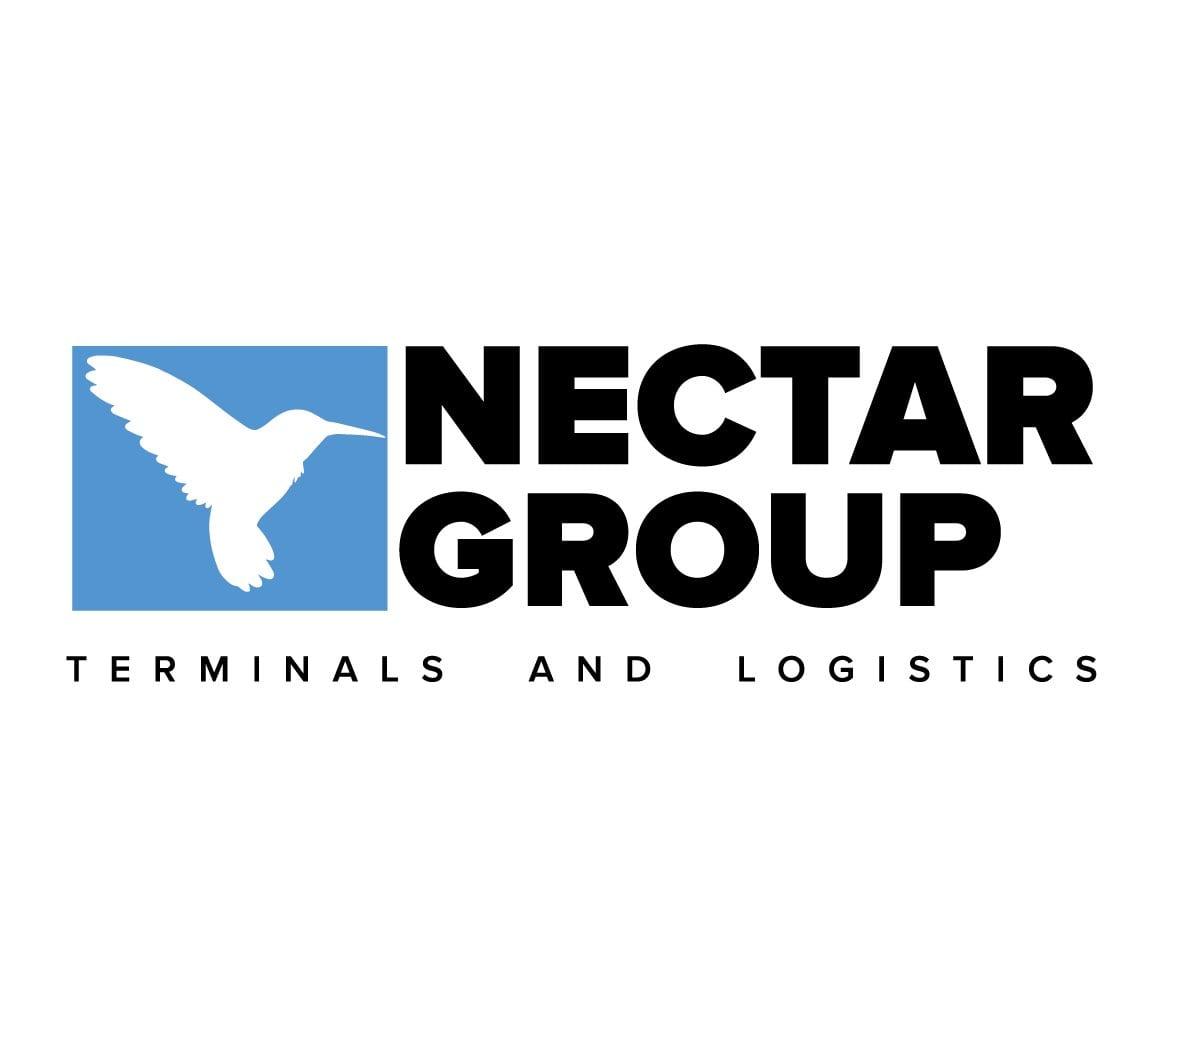 NectarGroupMaster_strap_Logo-01 square